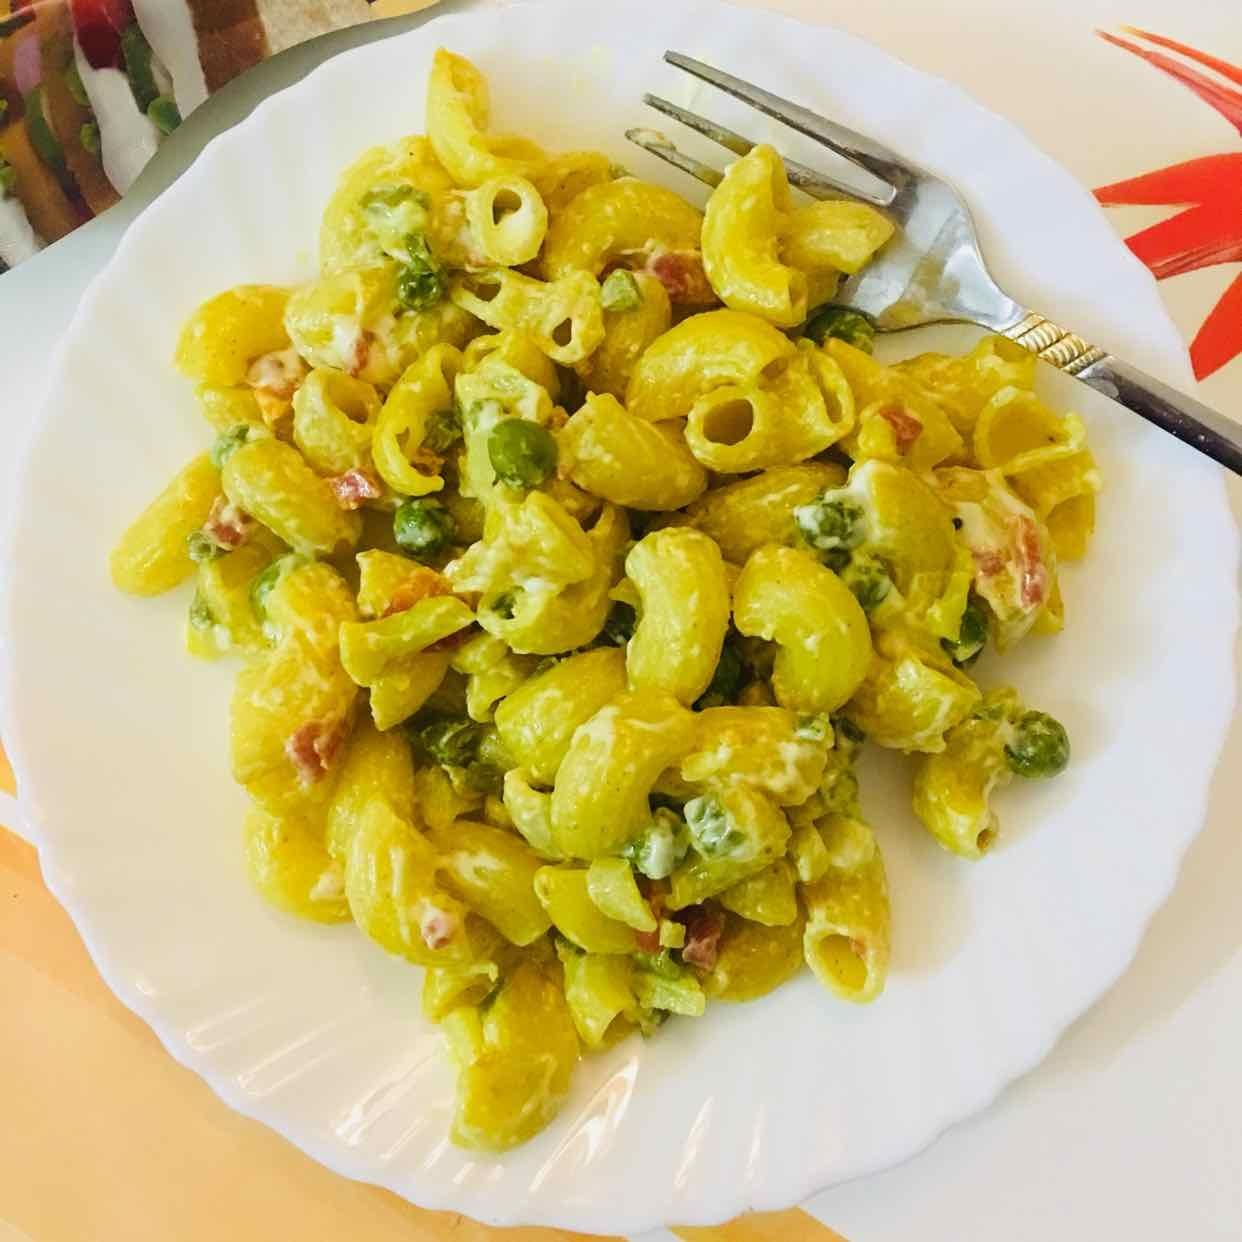 How to make Veg pasta